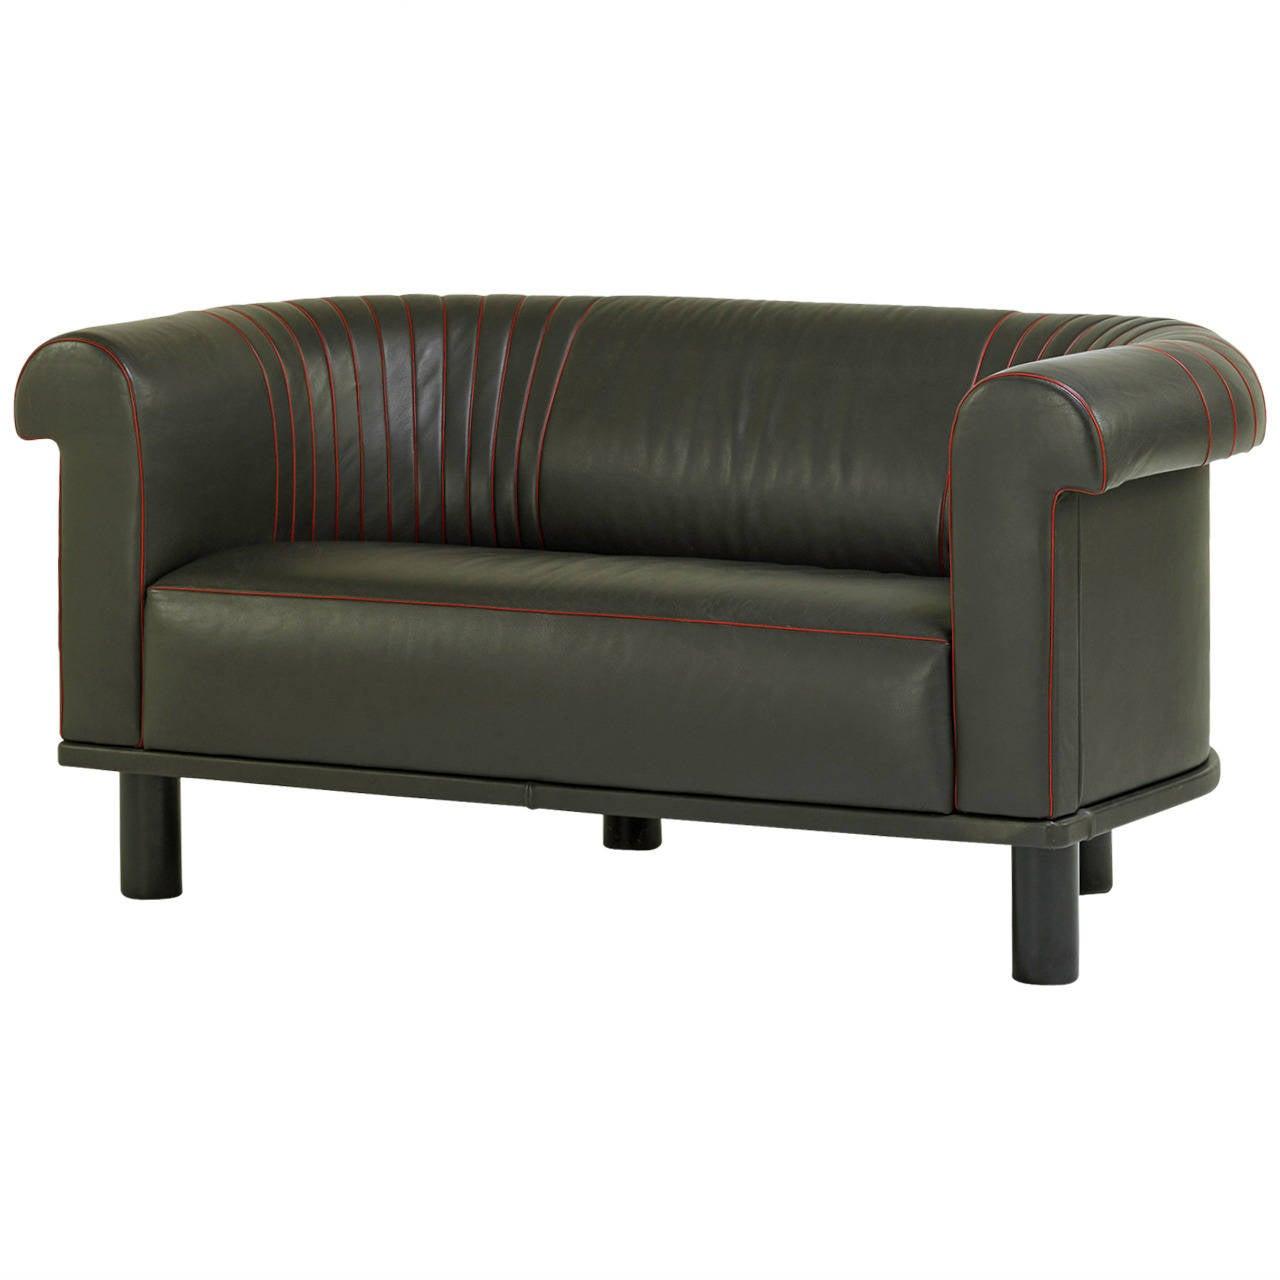 Barrel Back Leather Sofa, Switzerland For Sale at 1stdibs